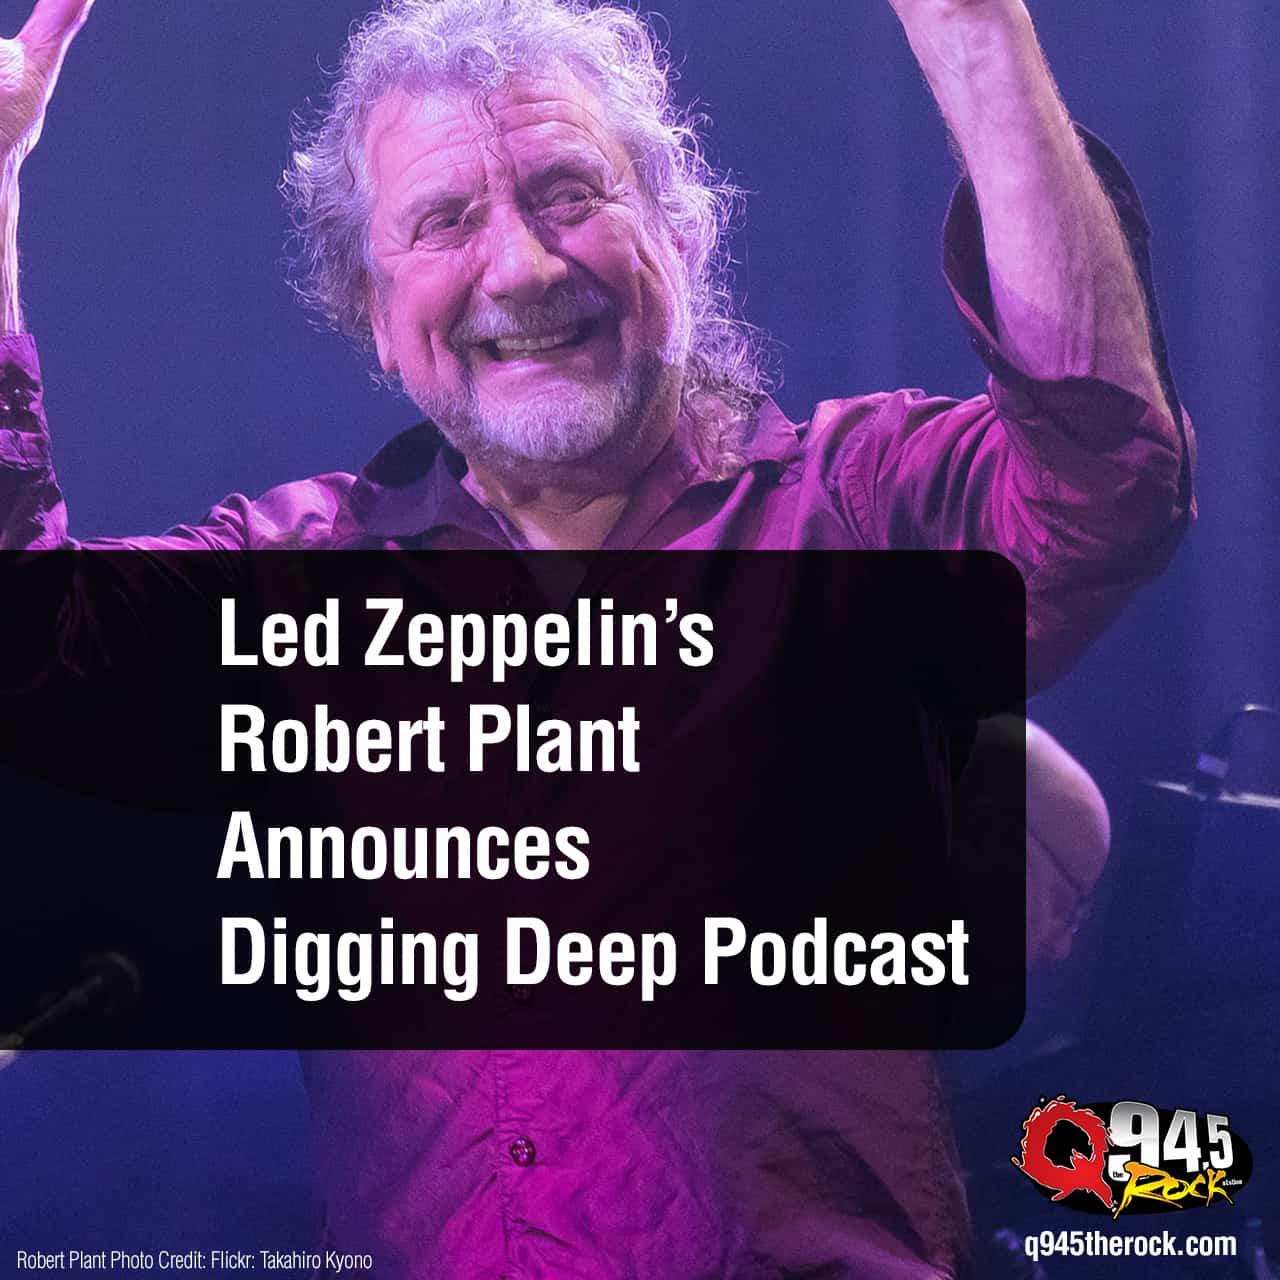 Robert Plant Announces Digging Deep Podcast